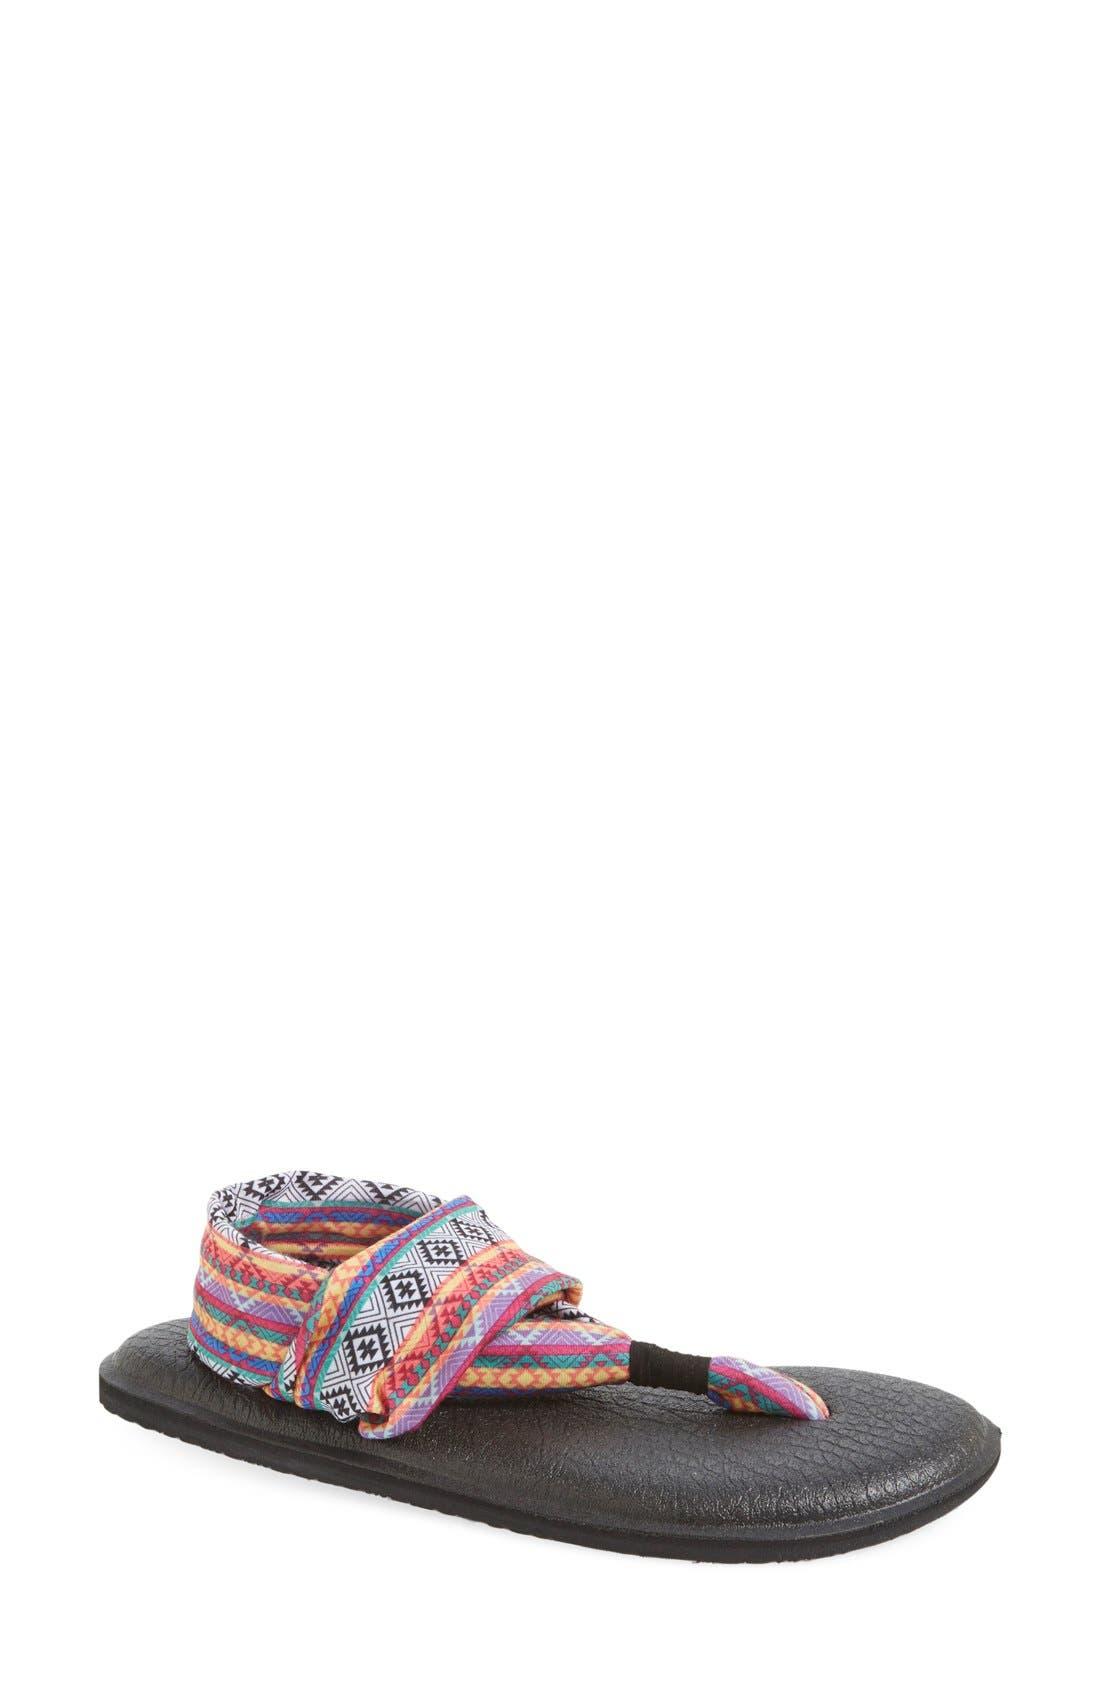 'Yoga Sling 2' Sandal,                             Main thumbnail 6, color,